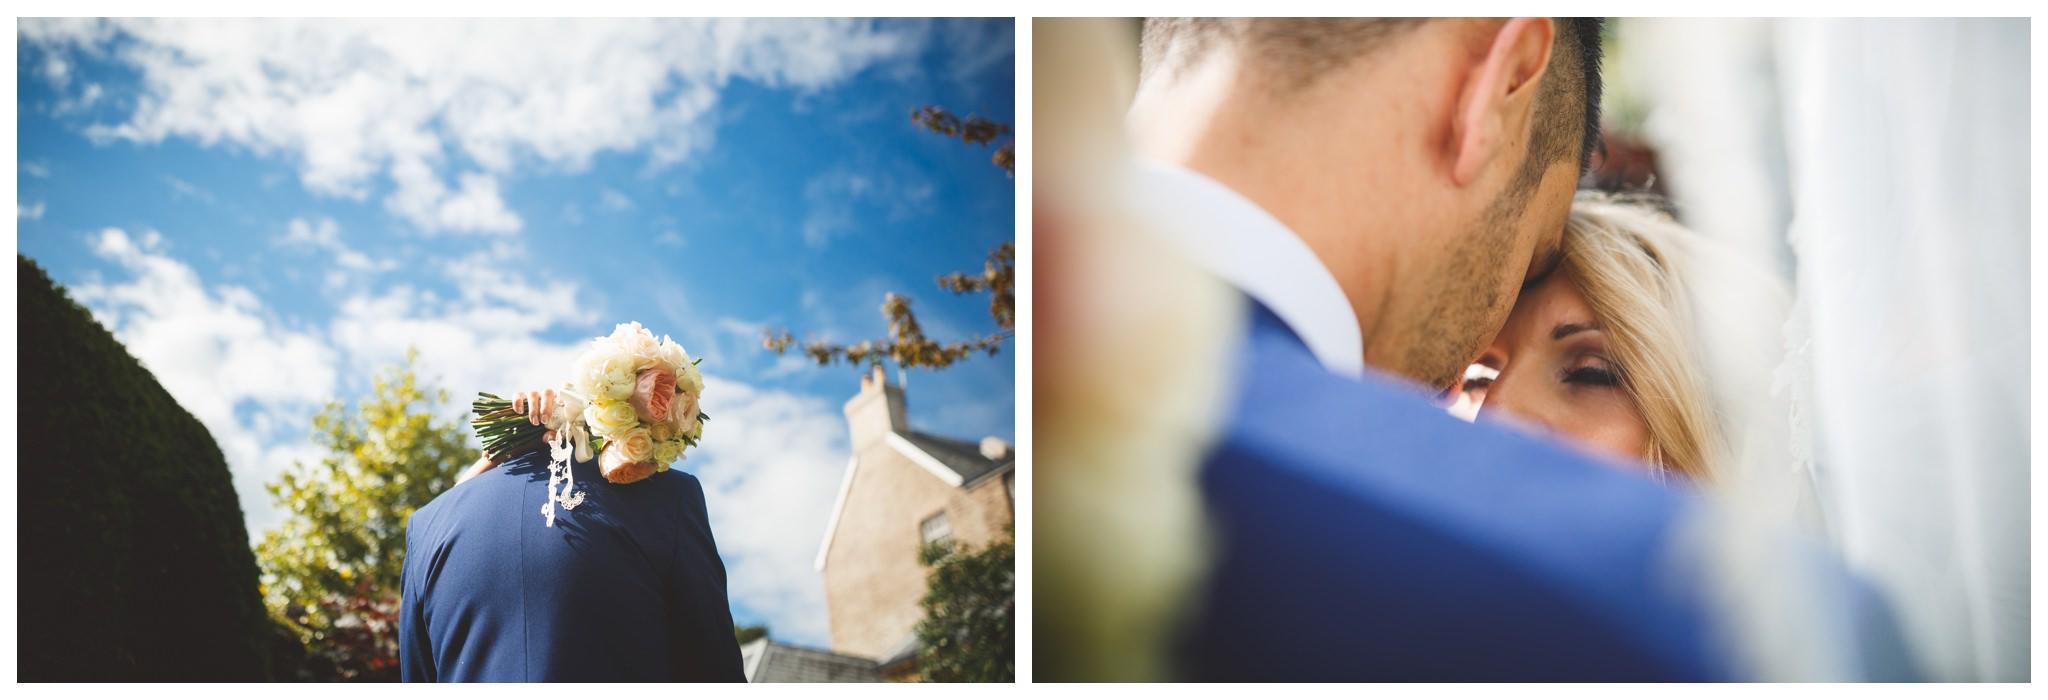 Richard Savage Photography - Wedding - Peterstone Court Brecon - 2016-05-11_0044